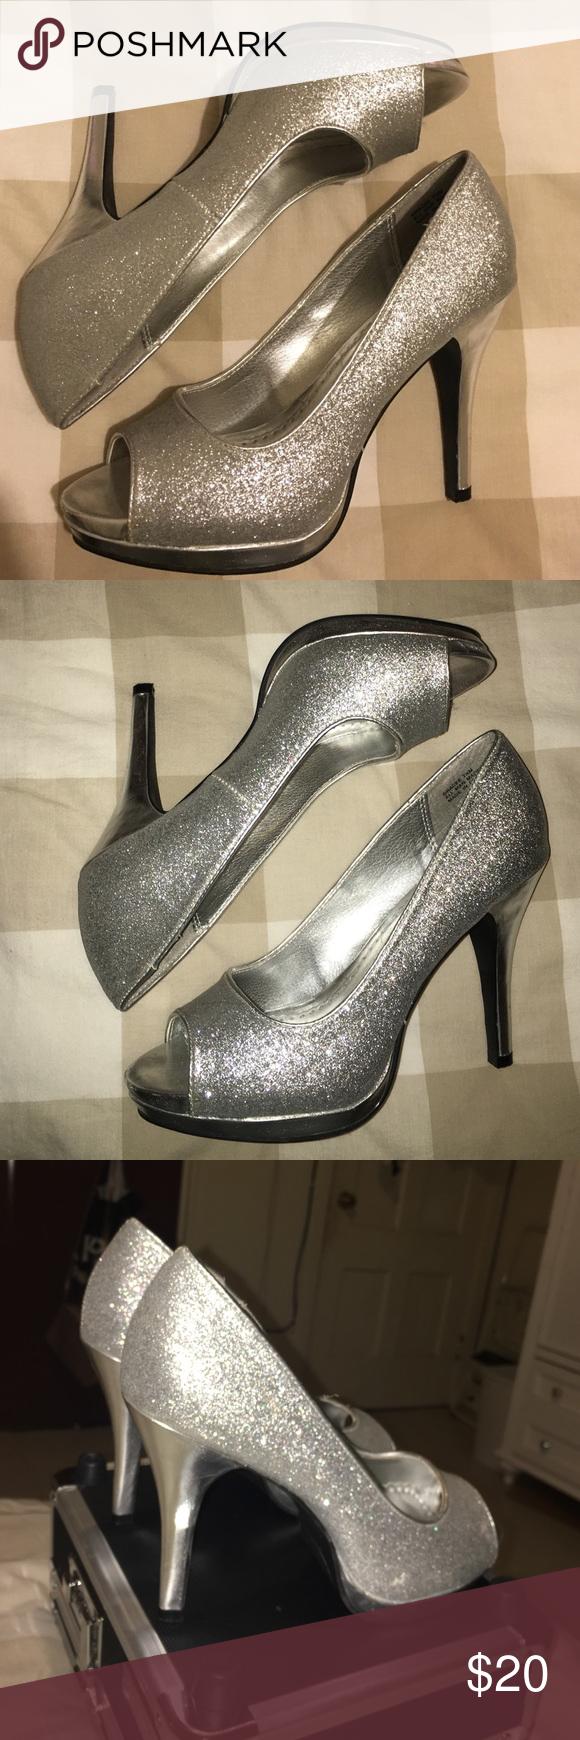 Glitter Heels -- Good condition Glitter heels -- Worn a few times, good condition! Rampage Shoes Heels